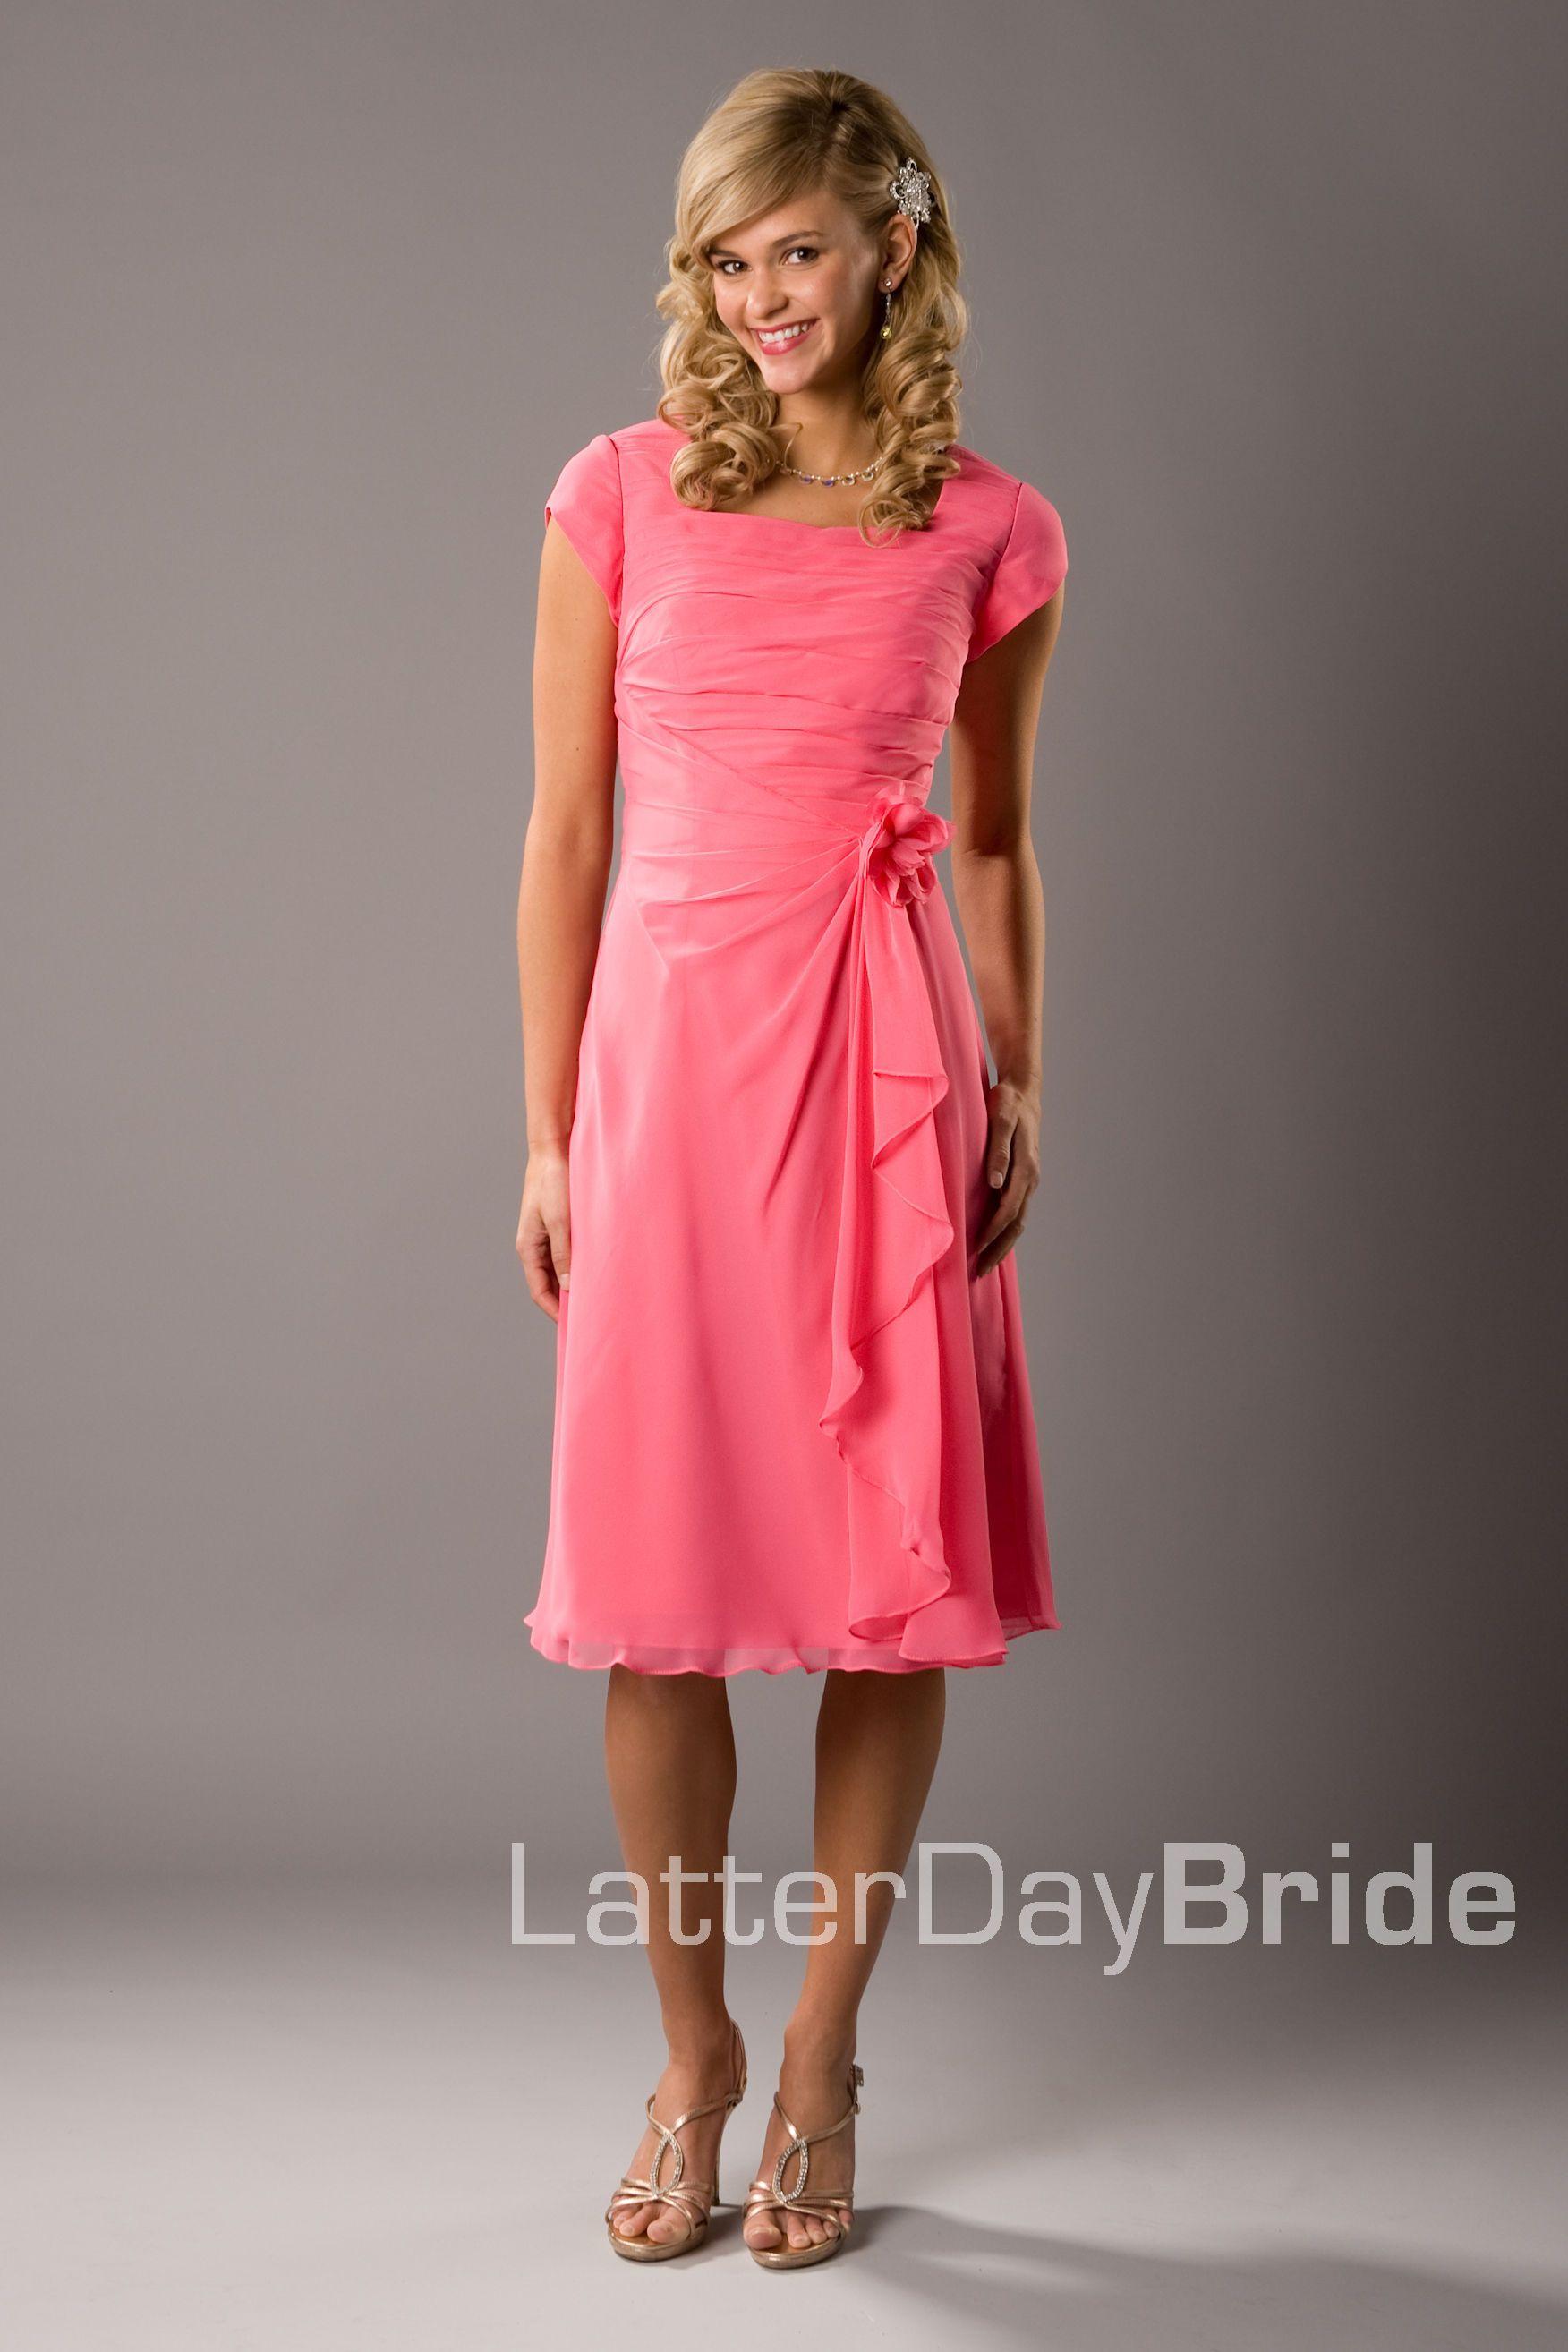 Bridesmaid & Prom, Elise | LatterDayBride & Prom Modest Mormon LDS ...